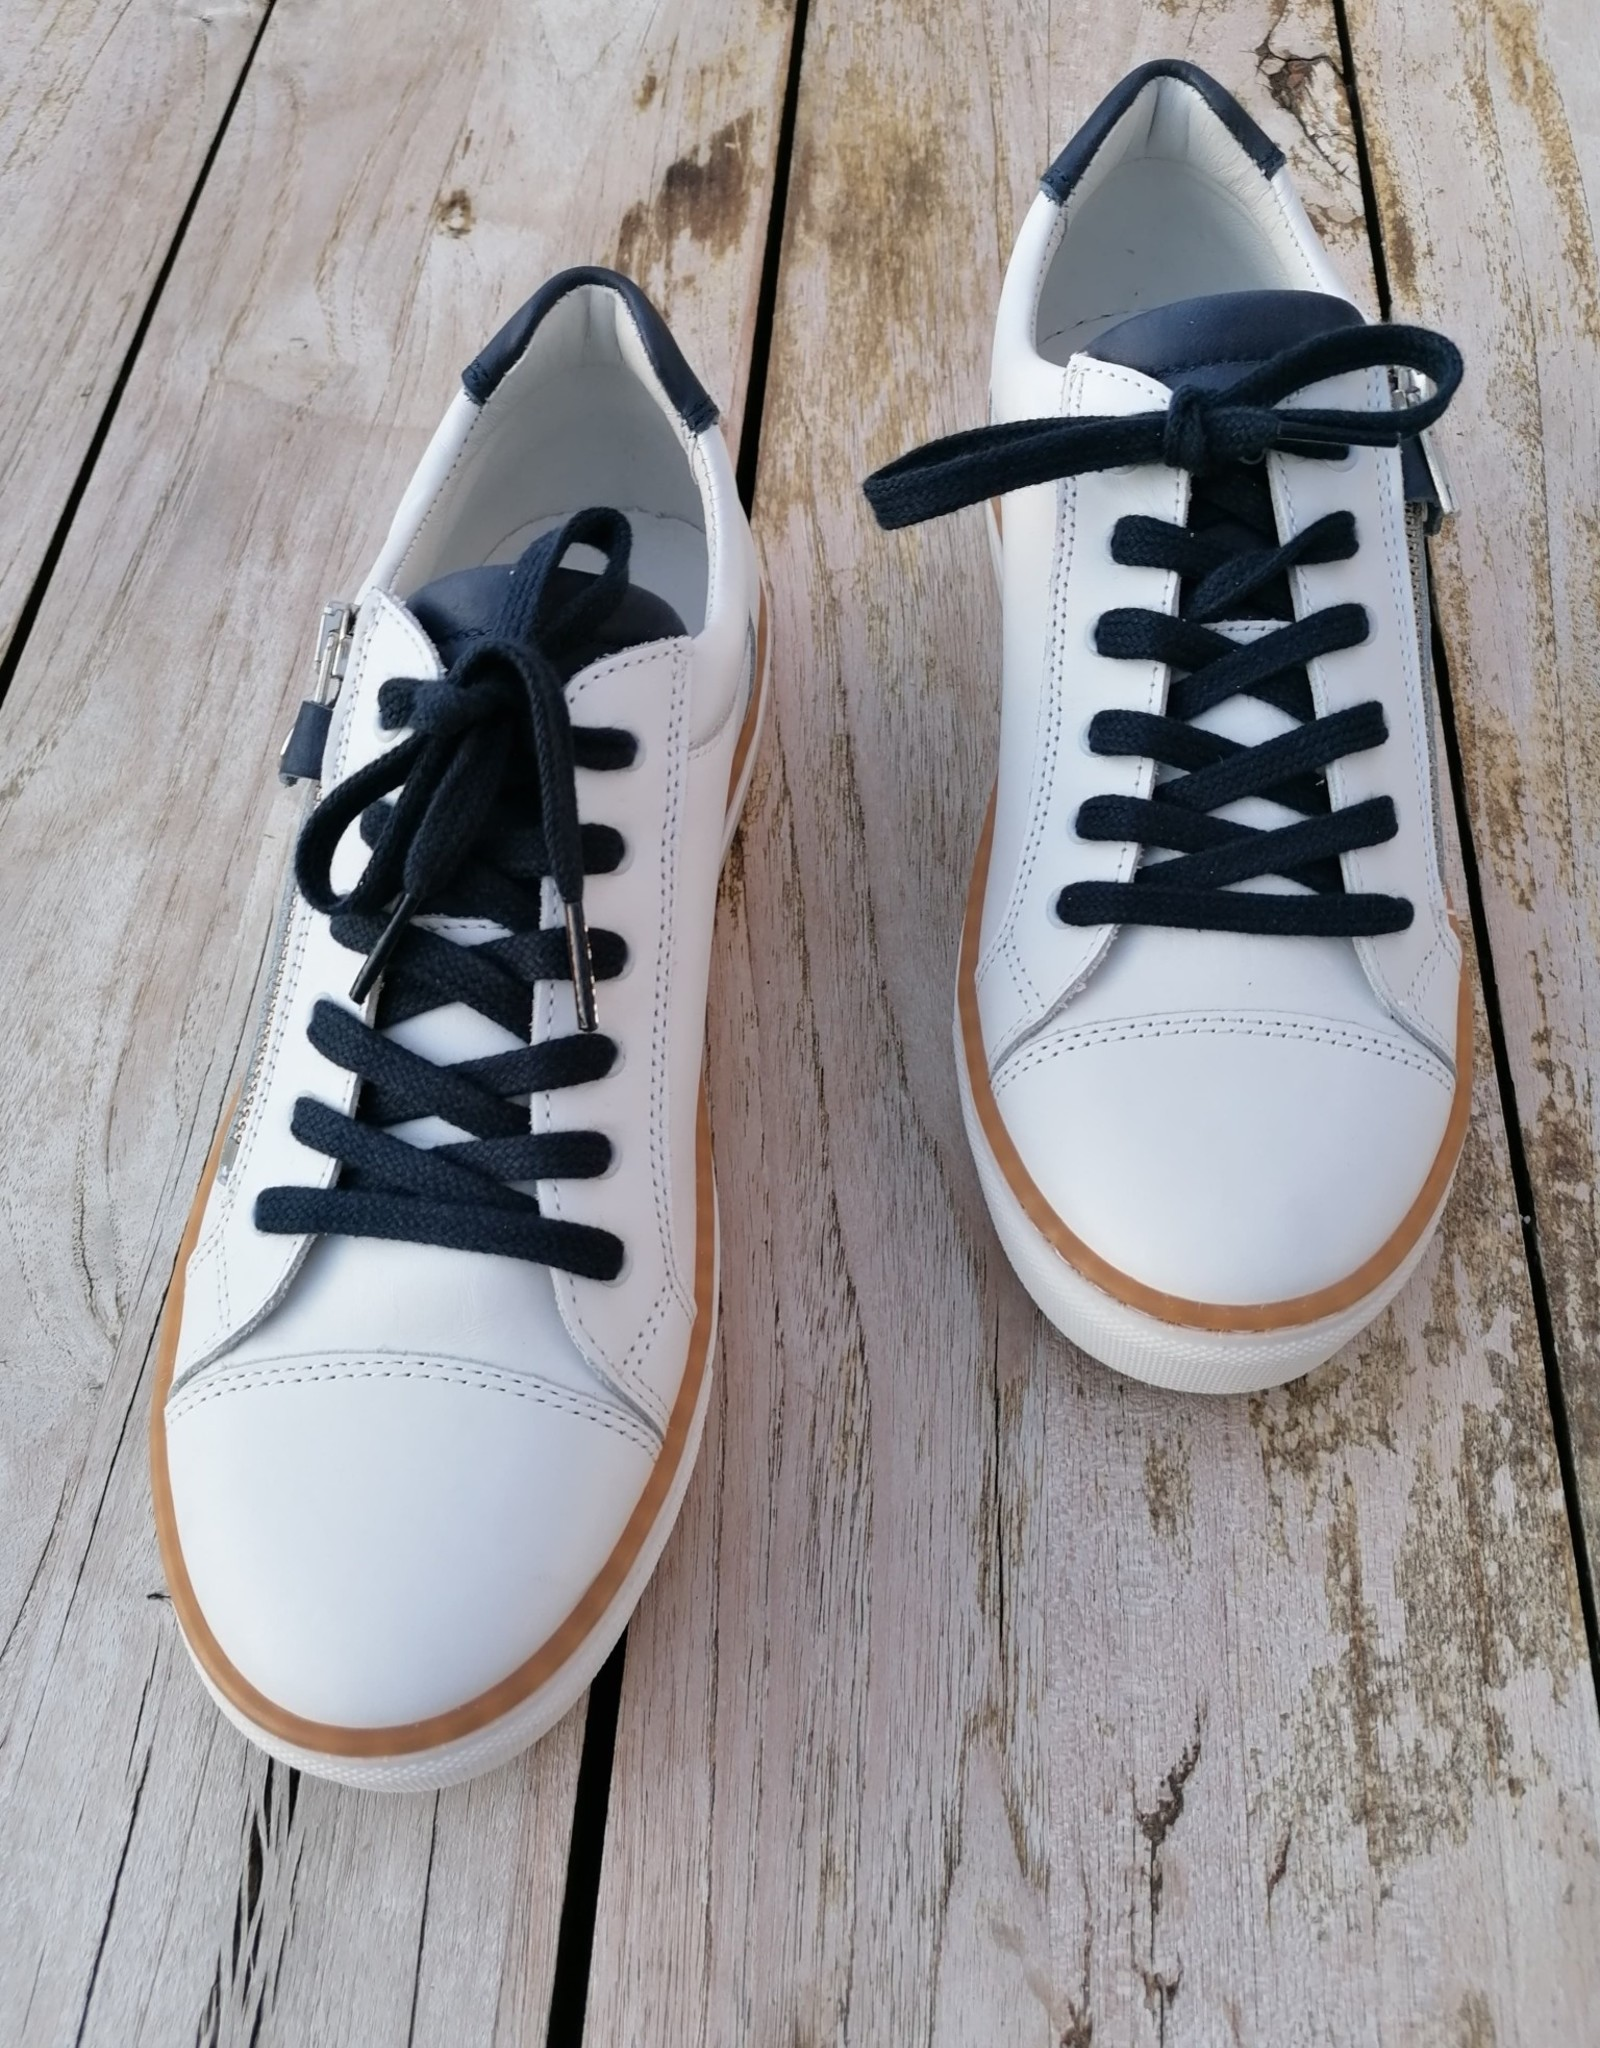 Bana & co Bana  & co witte sneaker met donker blauw